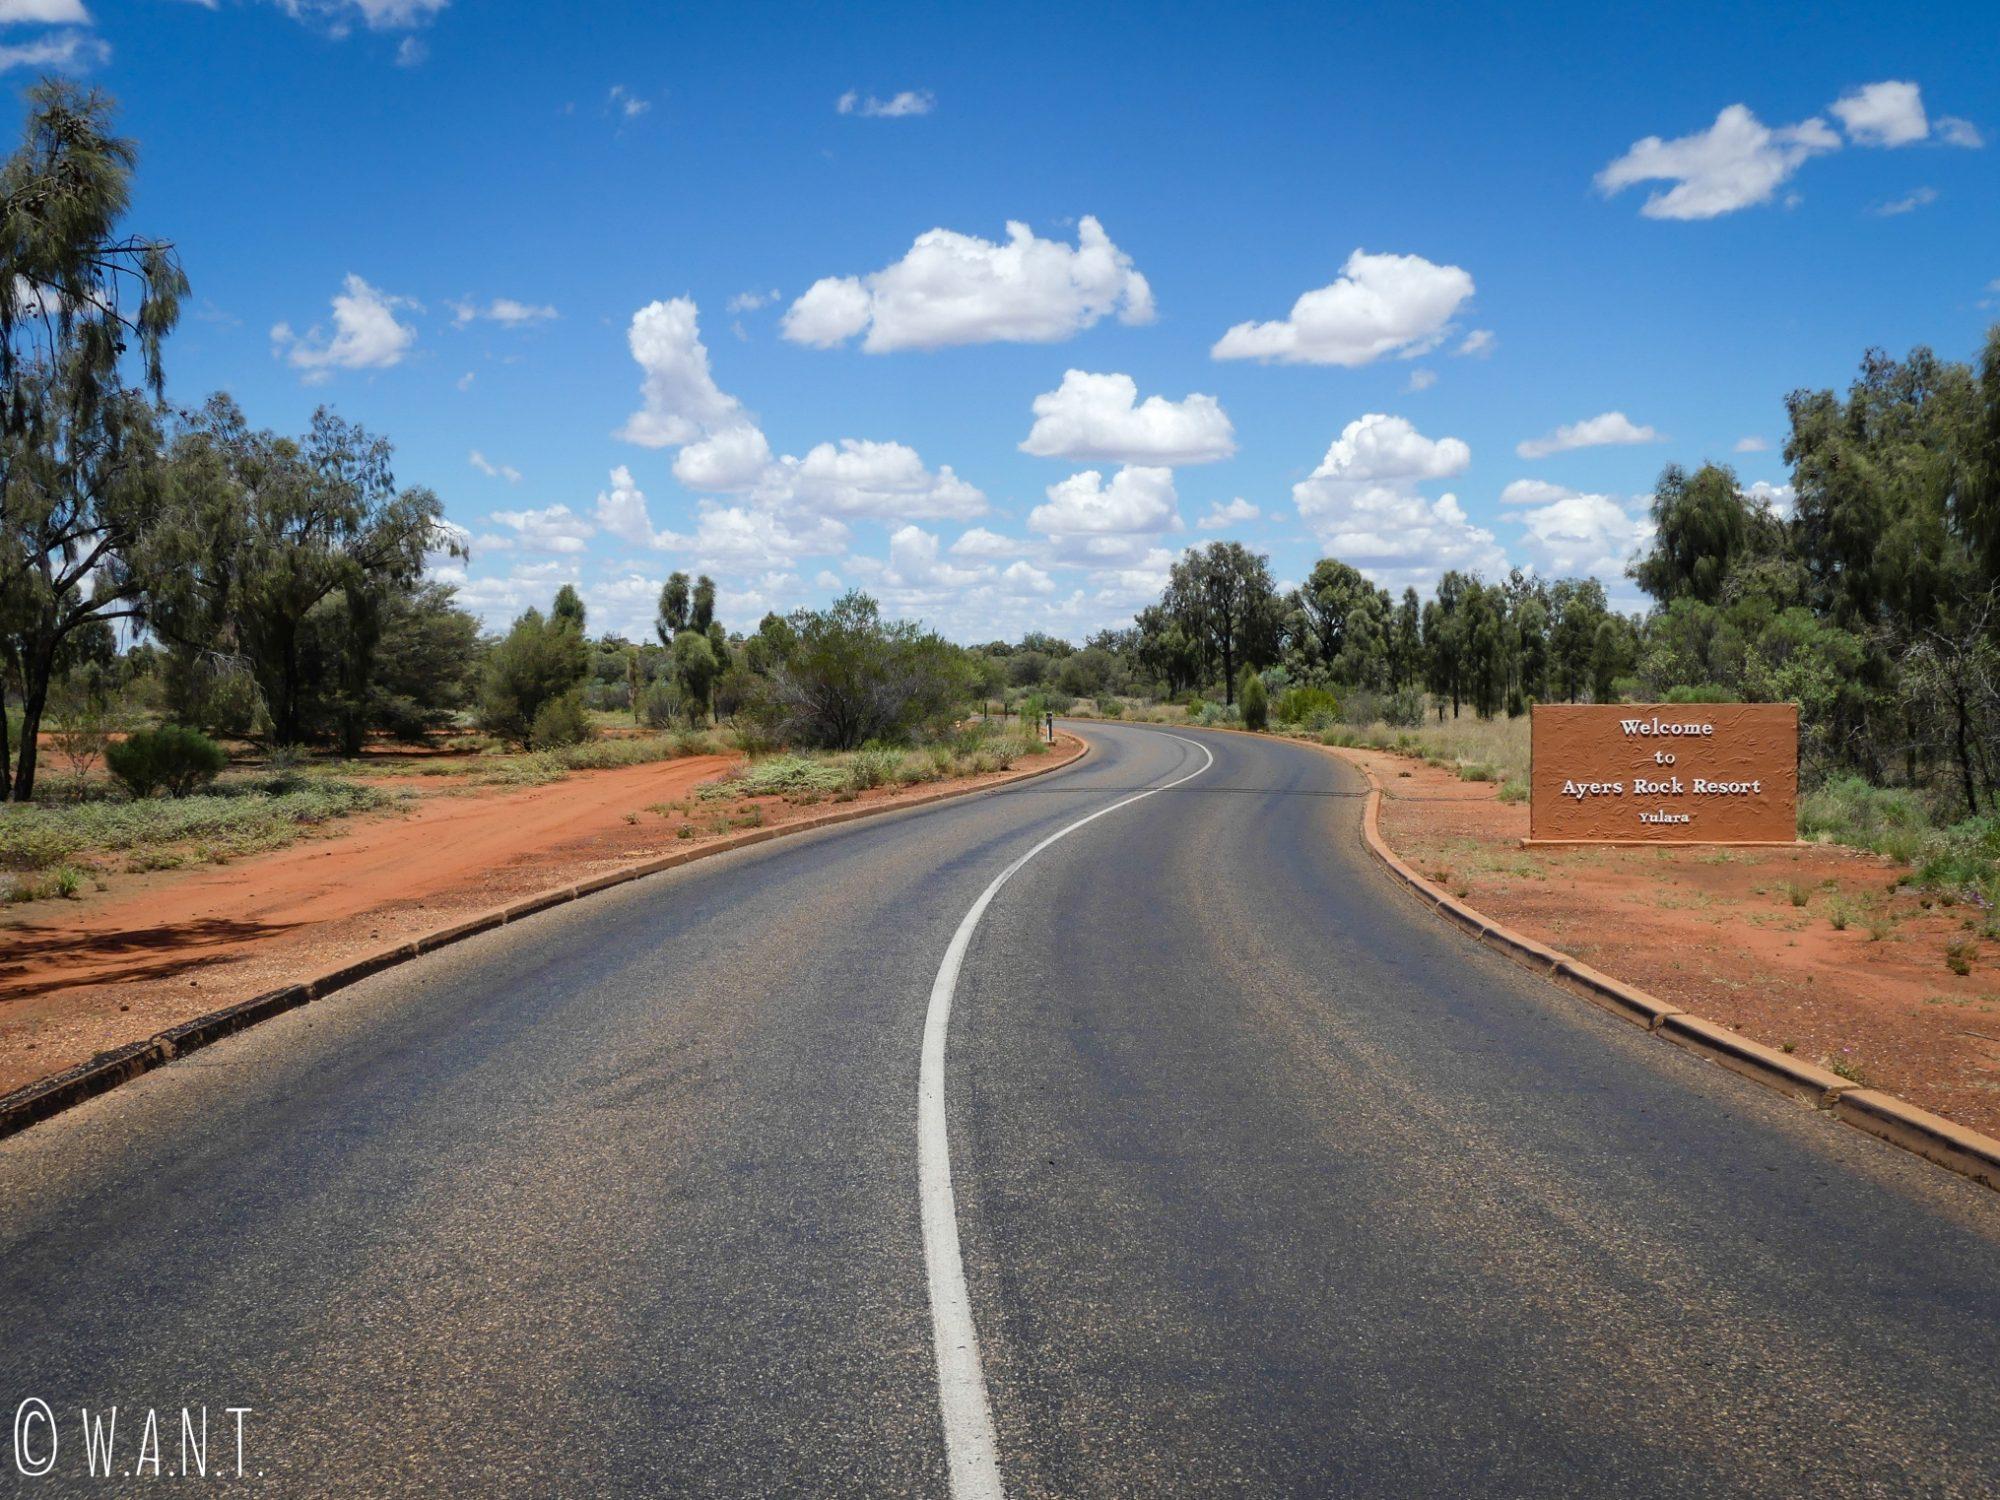 Entrée d'Ayers Rock Resort à côté du parc national Uluru-Kata Tjuta